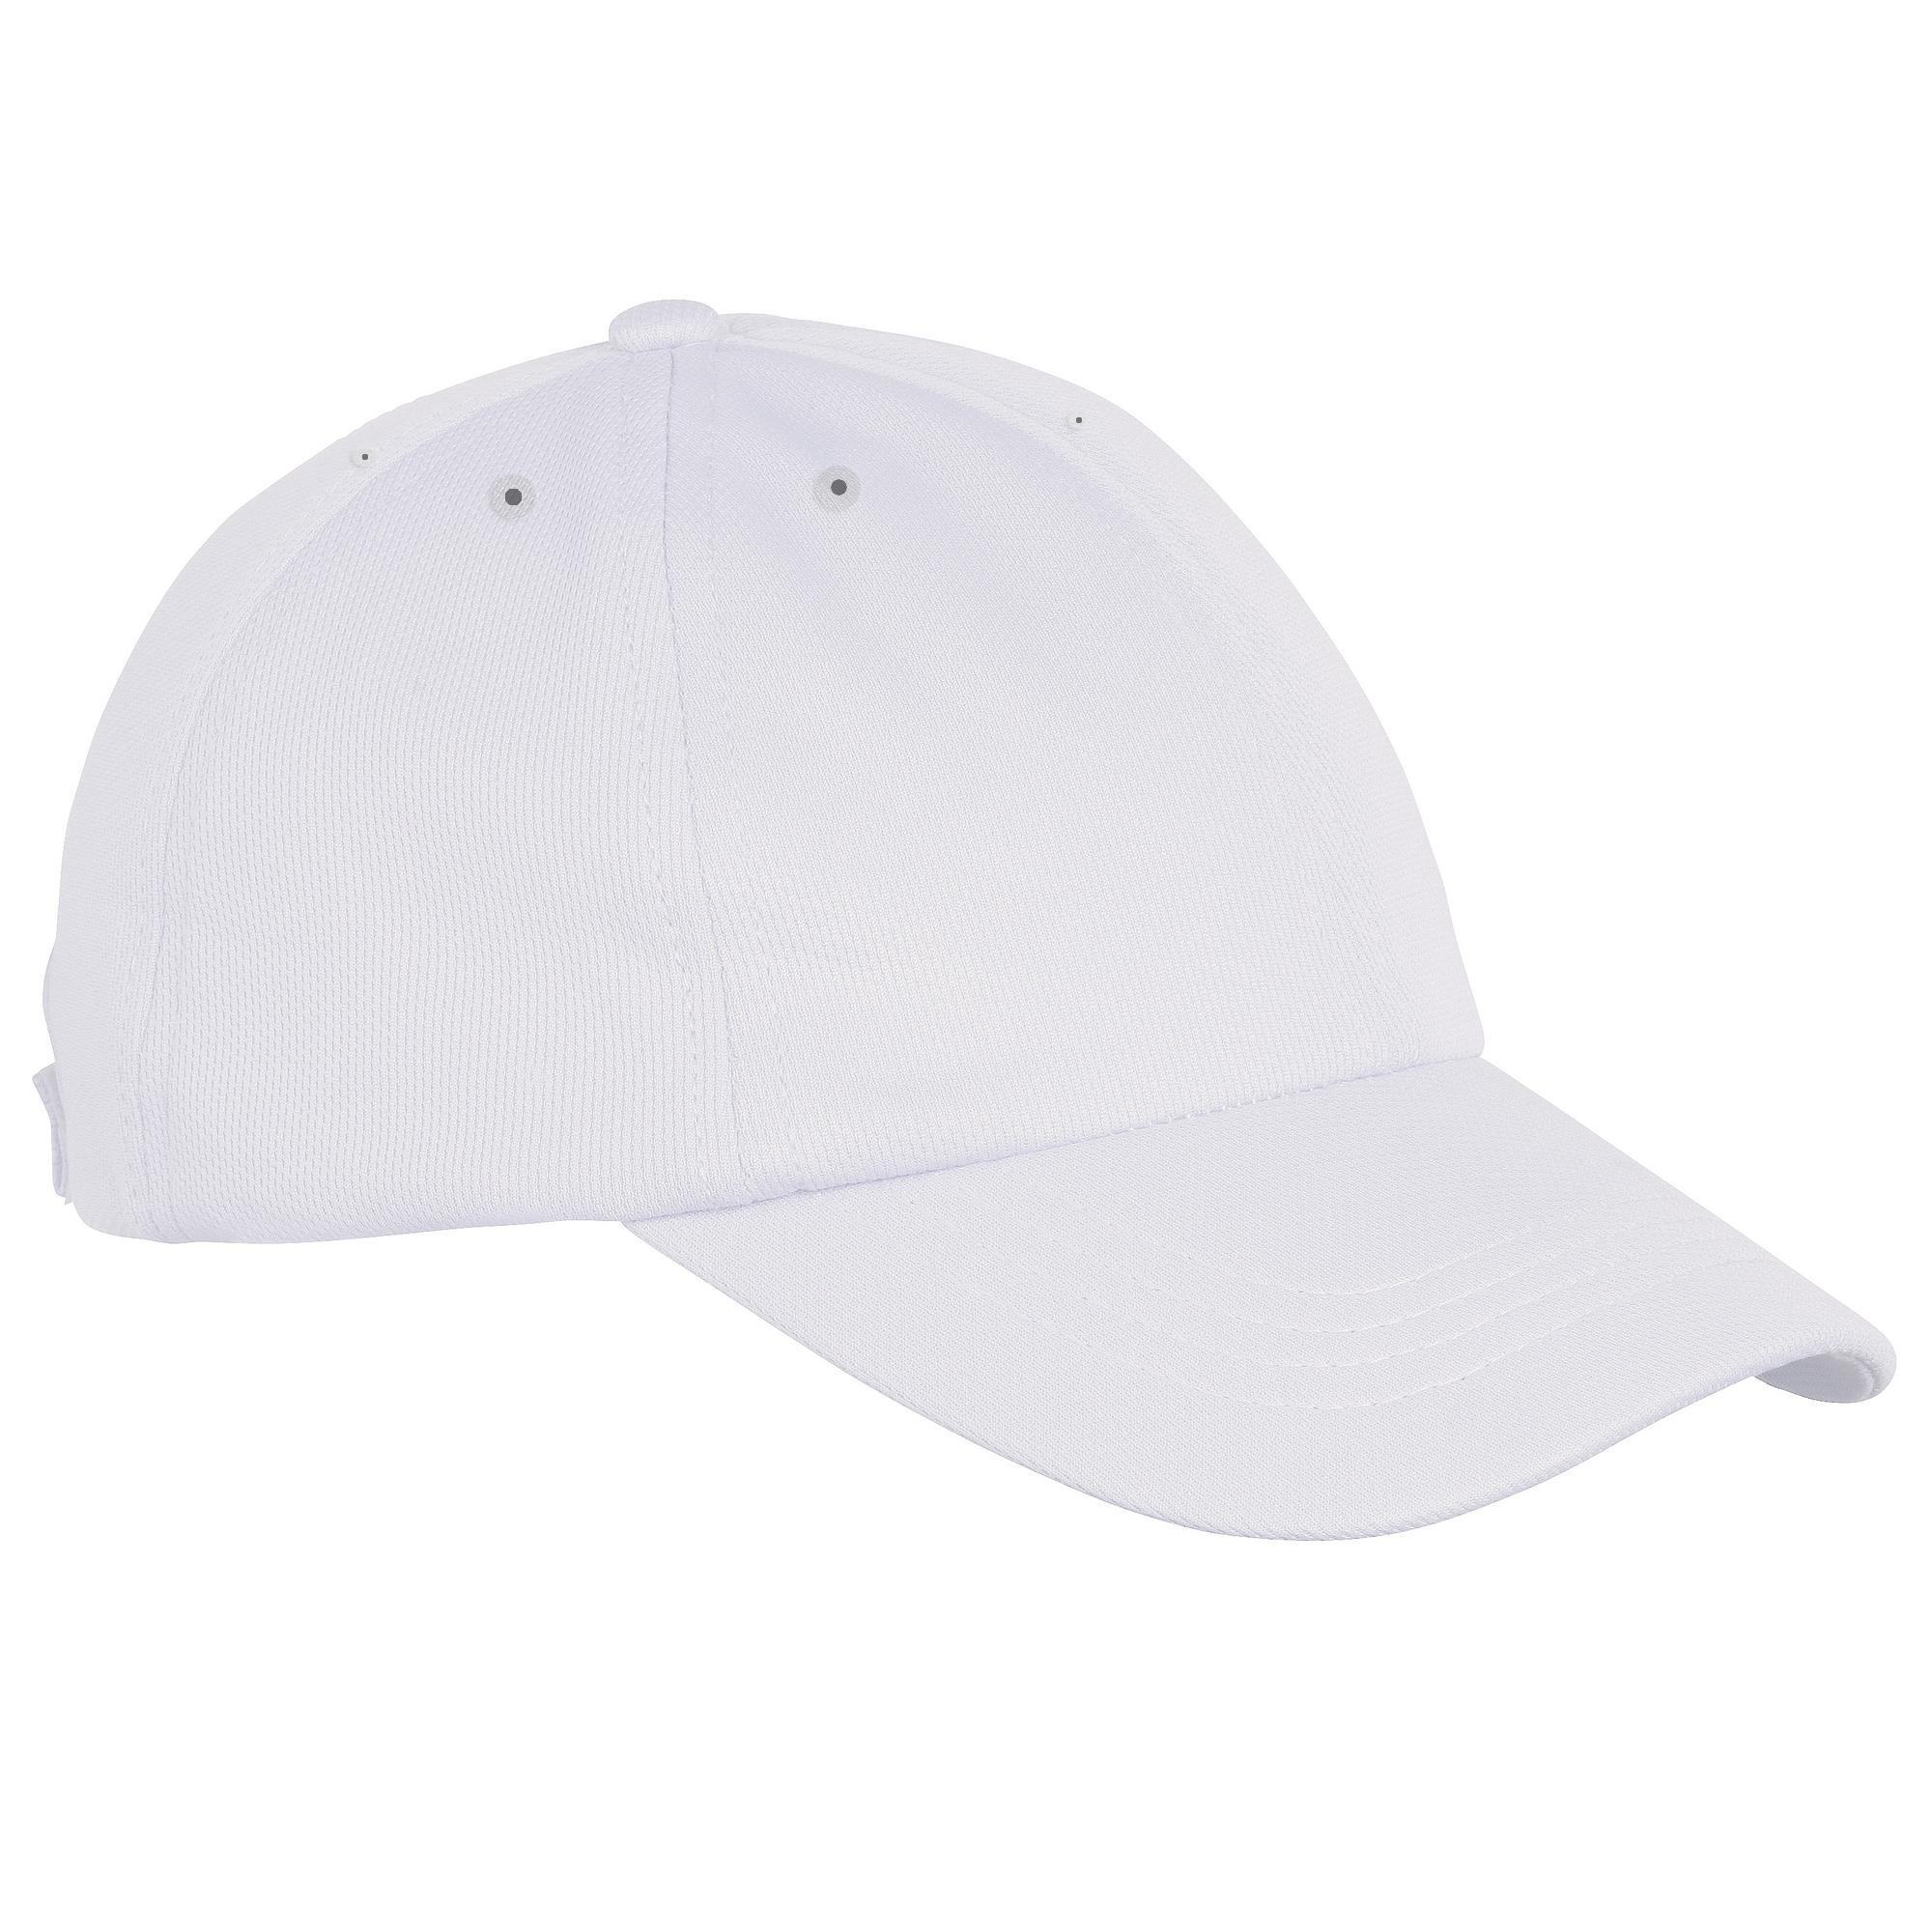 Image of AWDIS Baseball Cap »Baseballkappe (2 Stück/Packung)«